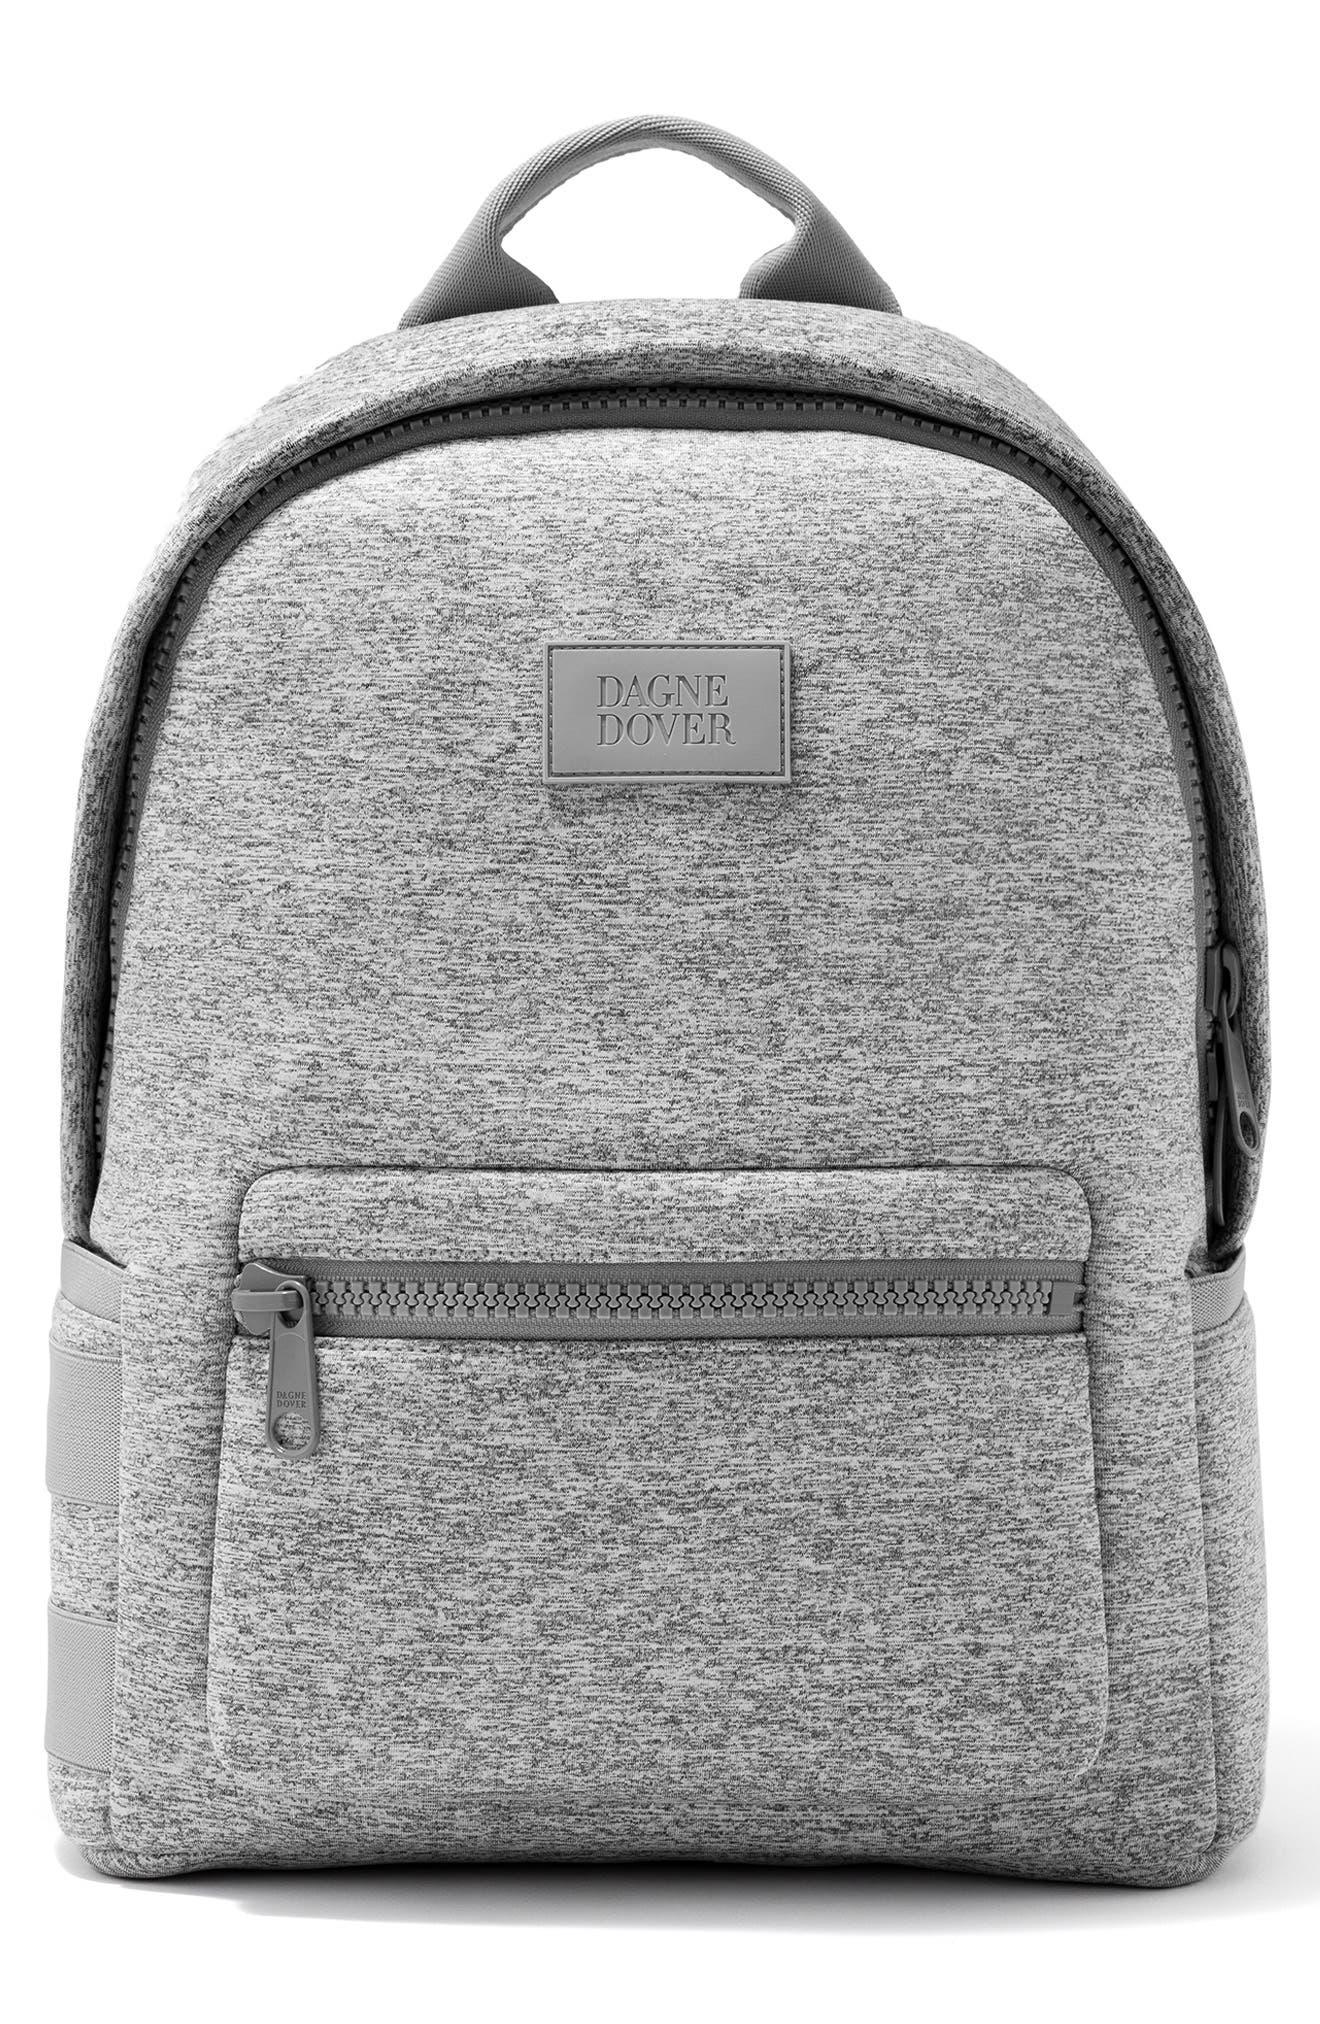 DAGNE DOVER 365 Dakota Neoprene Backpack - Grey in Heather Grey